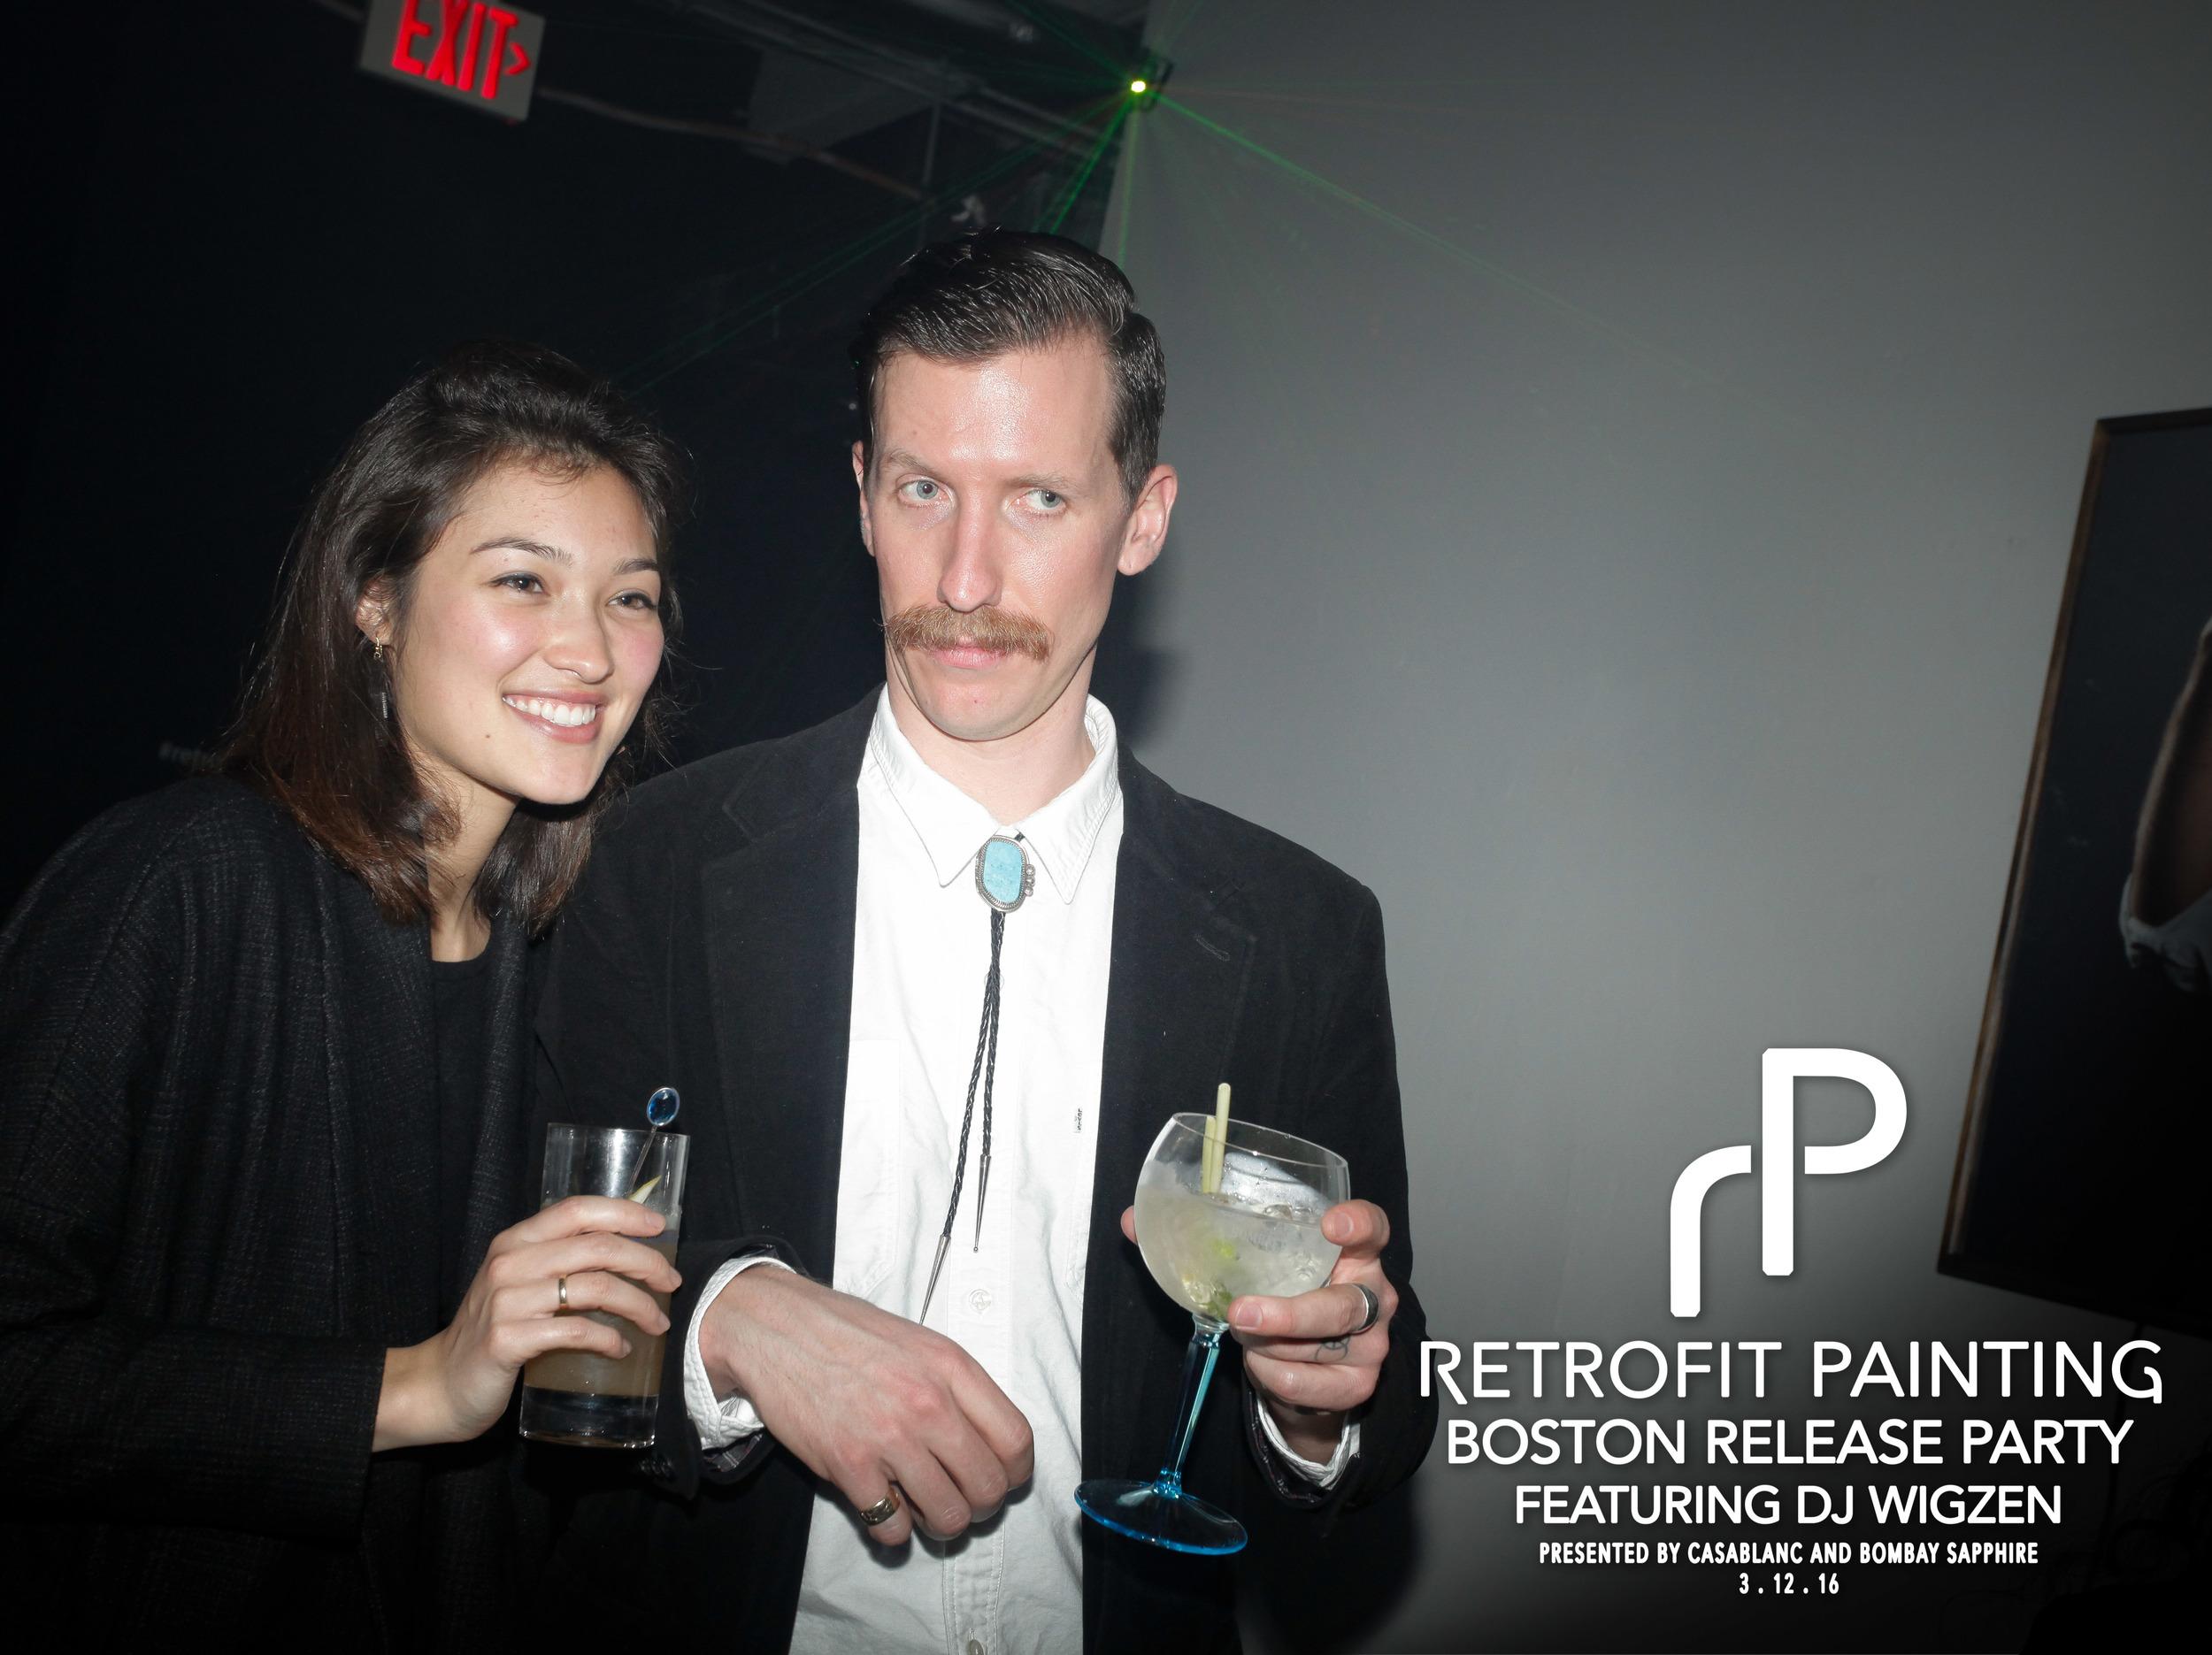 Retrofit Painting Boston Release Party 0150.jpg